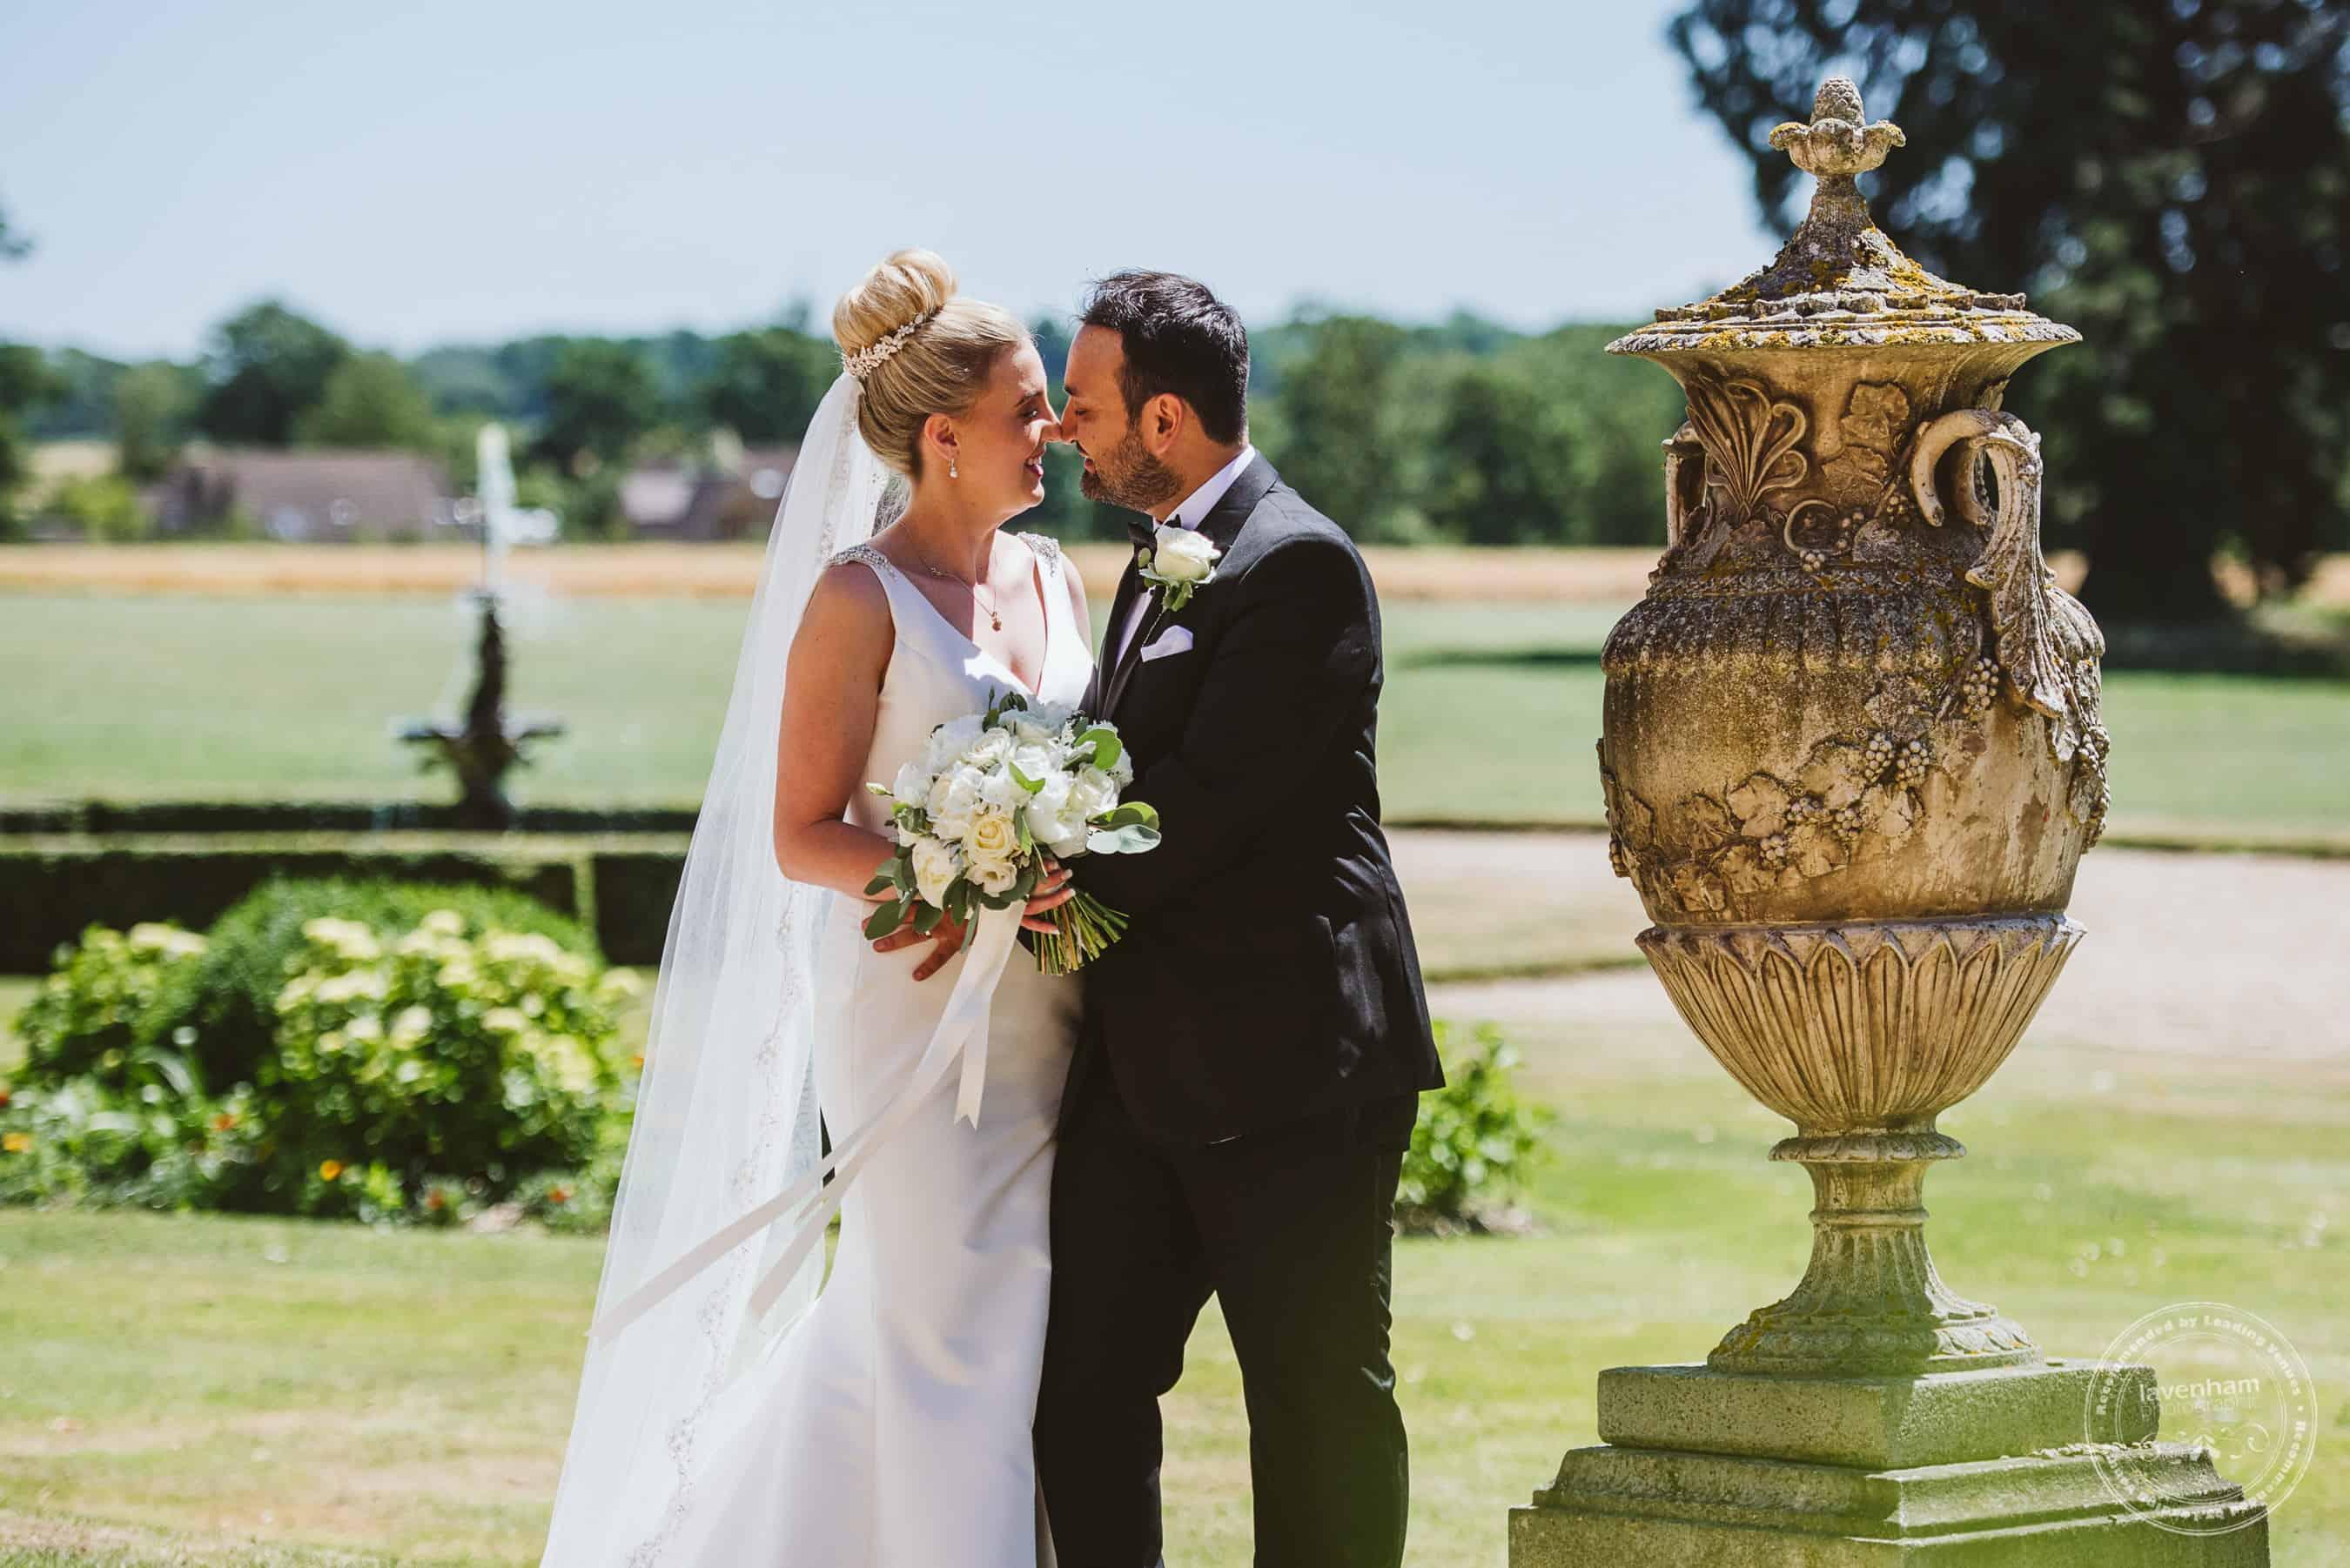 220618 Gosfield Hall Wedding Photography Lavenham Photographic 0100